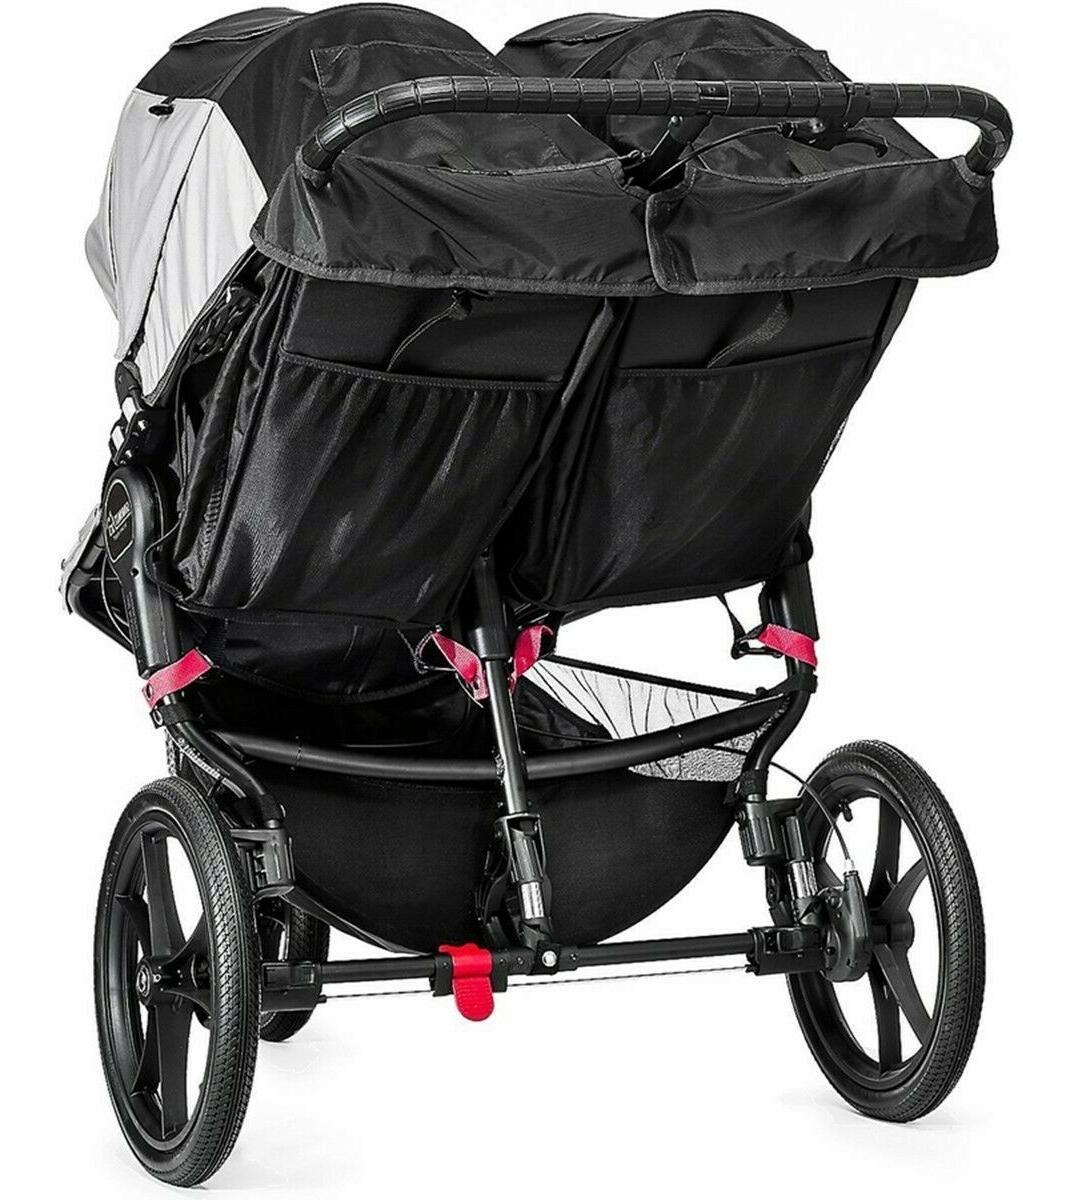 Baby Stroller Summit X3 Twin Infant Jogging - Gray/Black